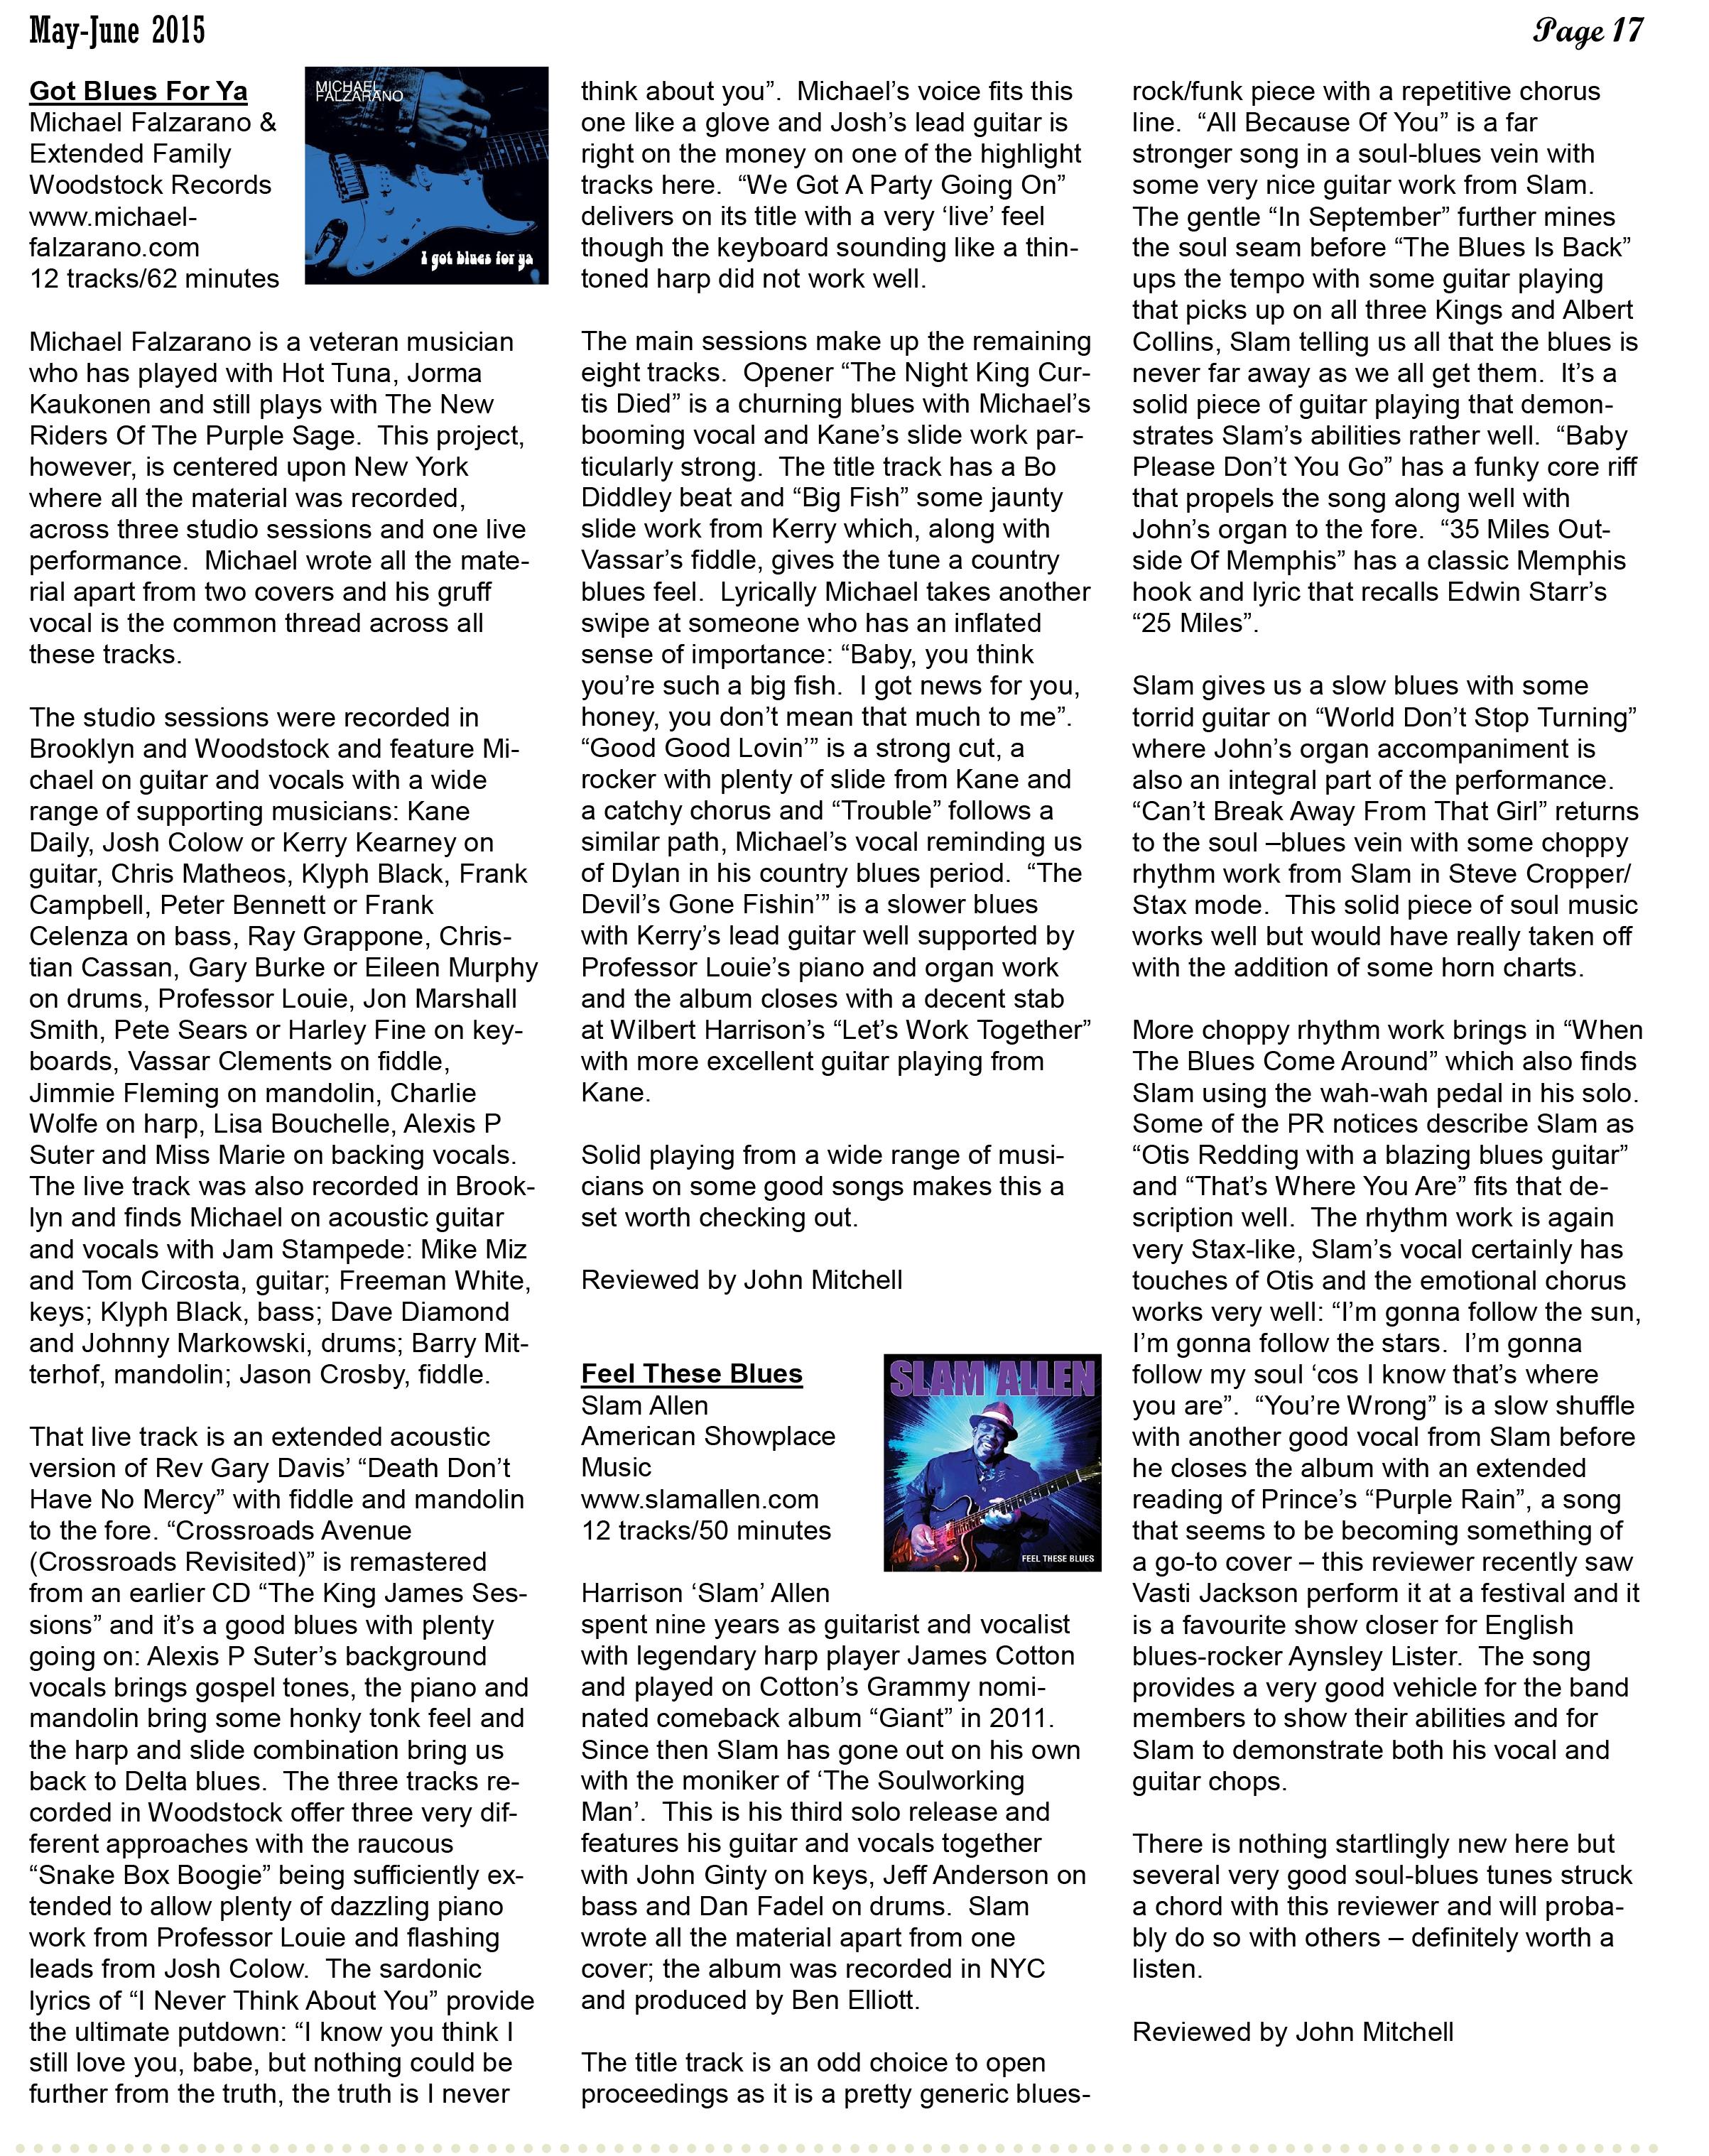 bluesgrooveMay-Jun 2015 Email  Version-17.jpg